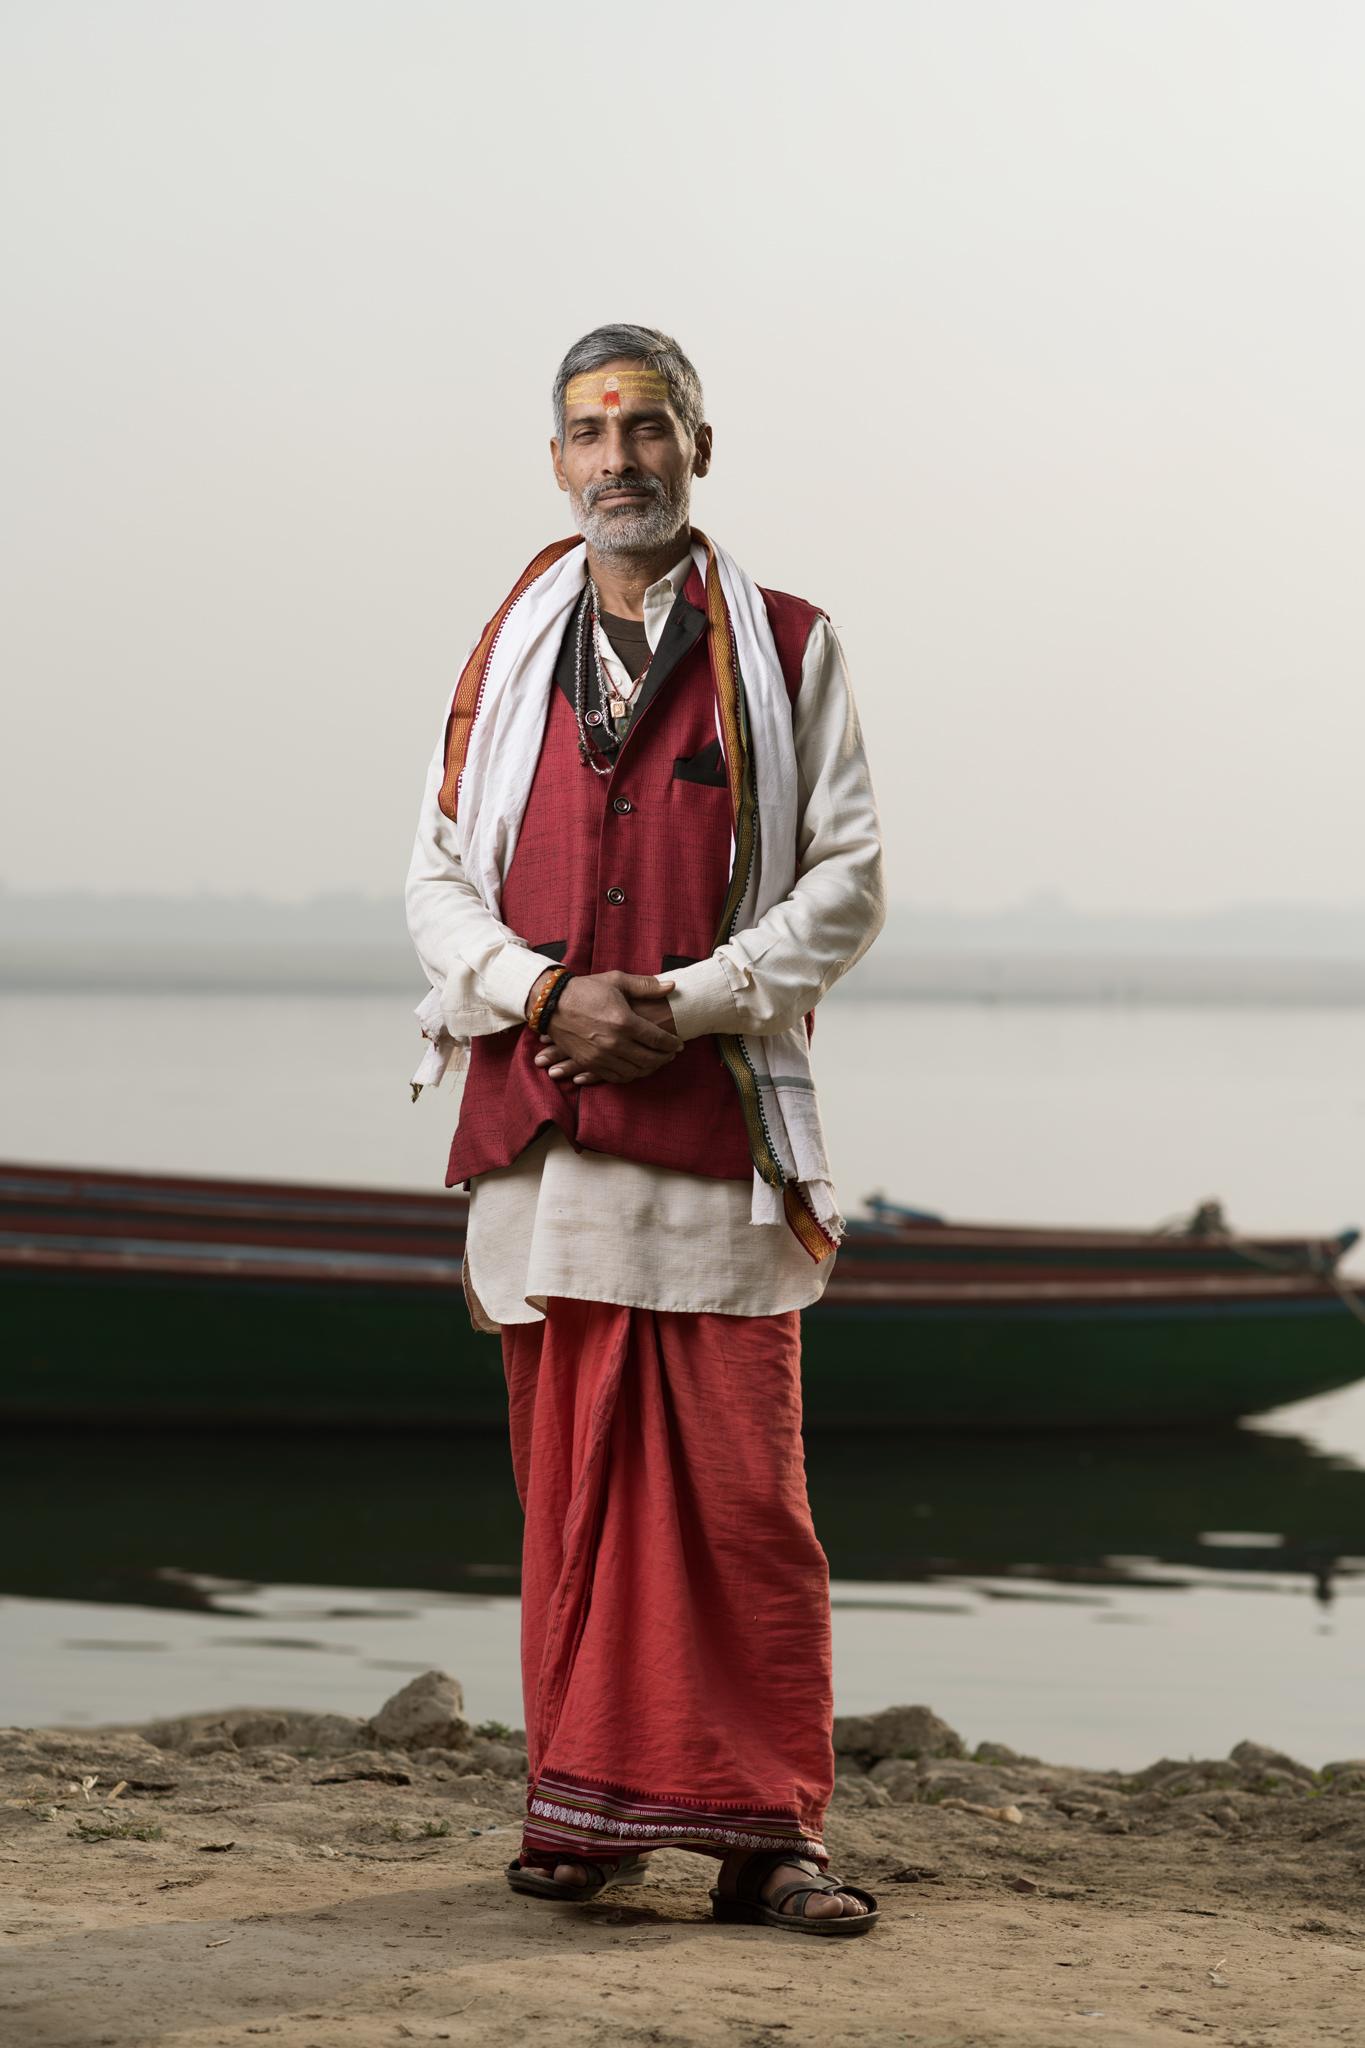 Varanasi_portrait_travel_photography_Manchester_Adventure_Photographer_Jan_Bella29.jpg